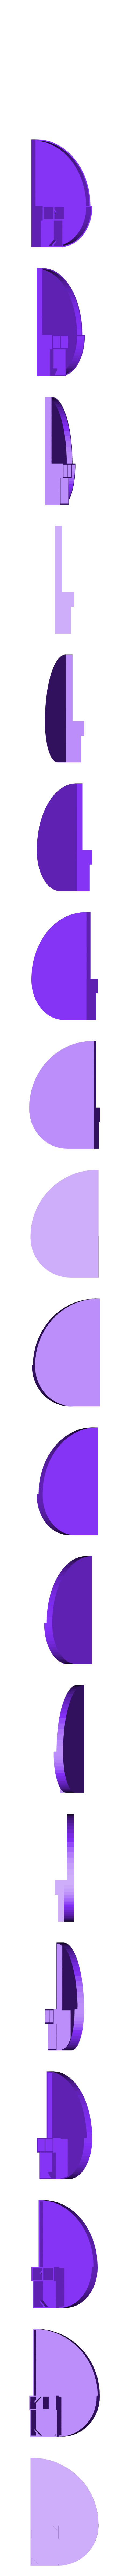 FibonacciOfficeOrgB.stl Download free STL file Fibonacci Office Organizer • 3D printer template, Duskwin